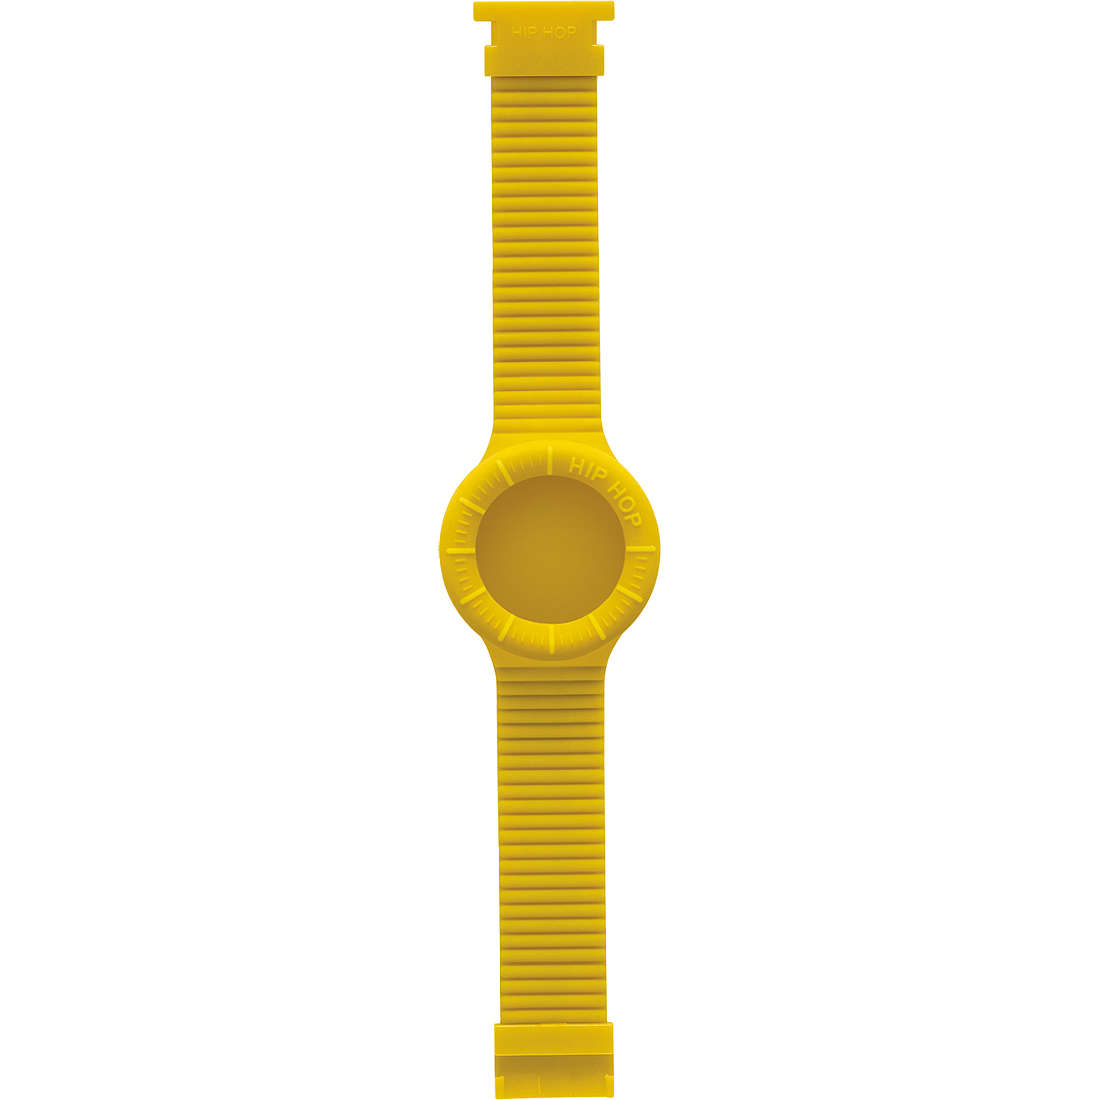 watch watch strap unisex Hip Hop Multifunzione HBU0181